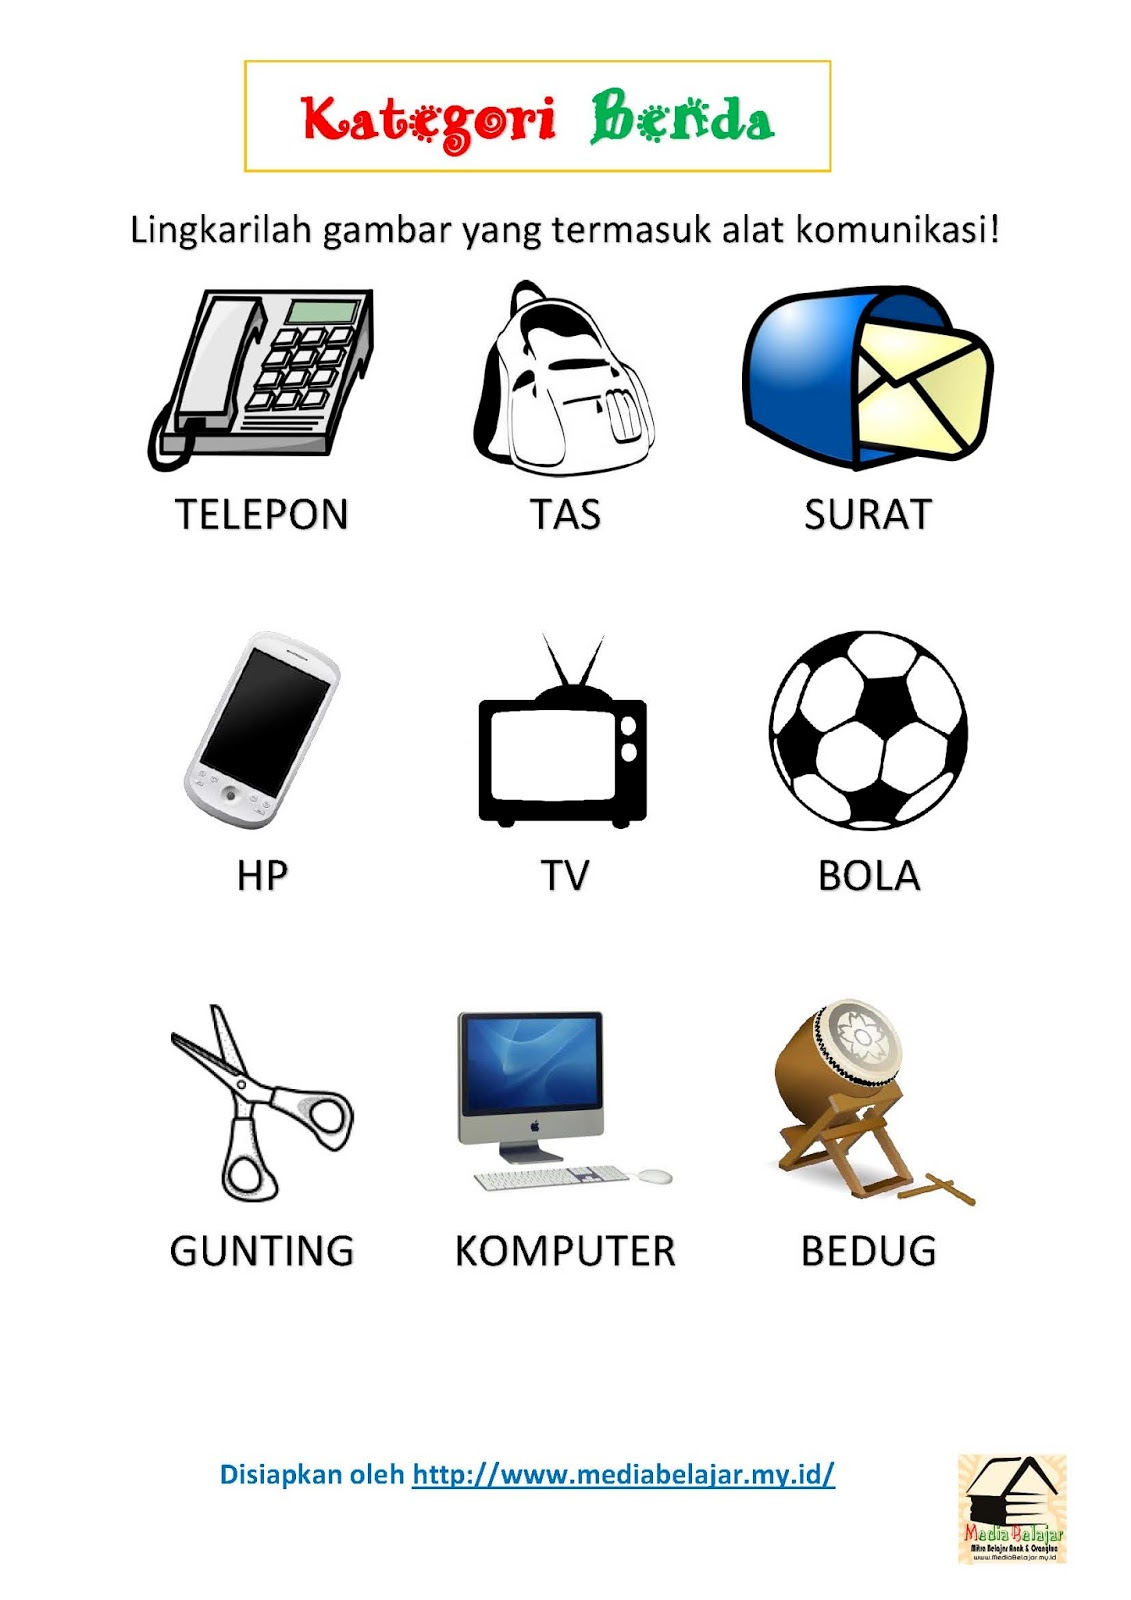 13 Jenis Alat Komunikasi Modern dan Tradisional yang